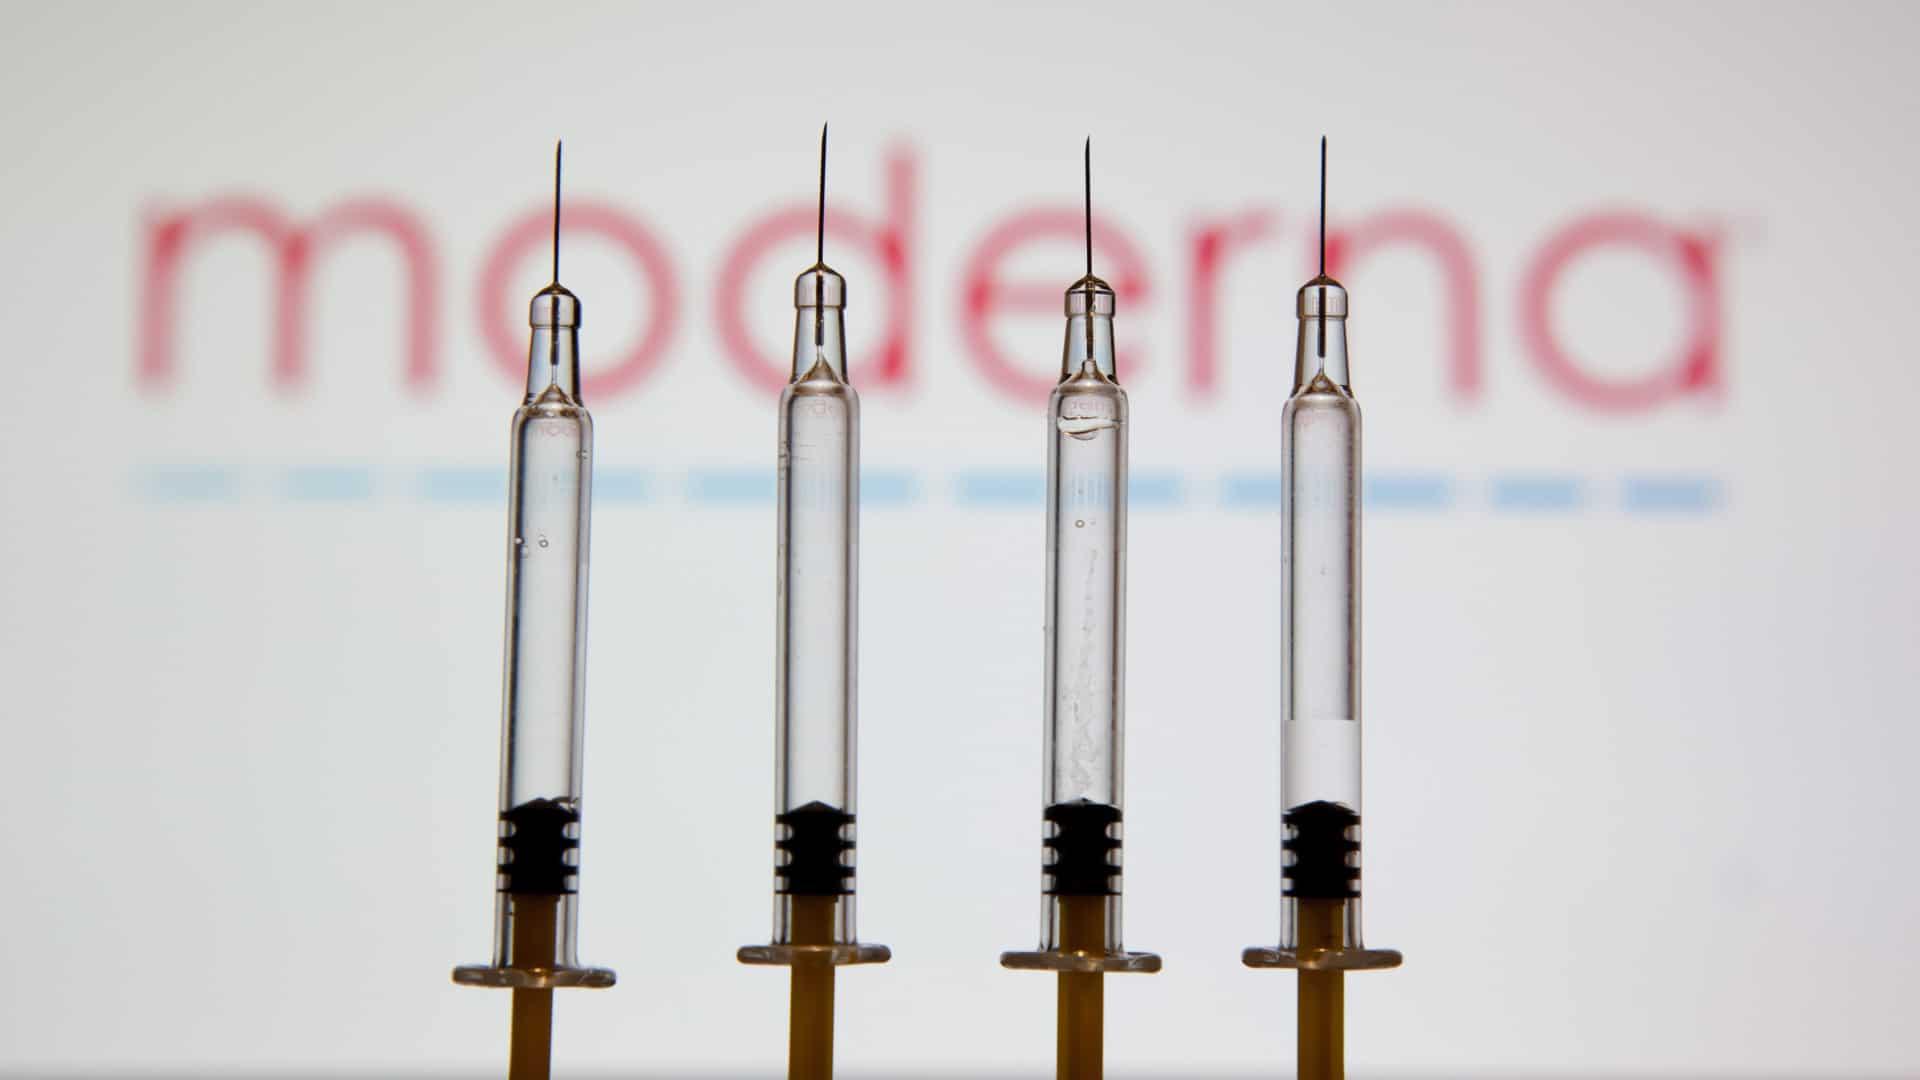 moderna vakcina koronavirus ellenszer oltas engedelyezes